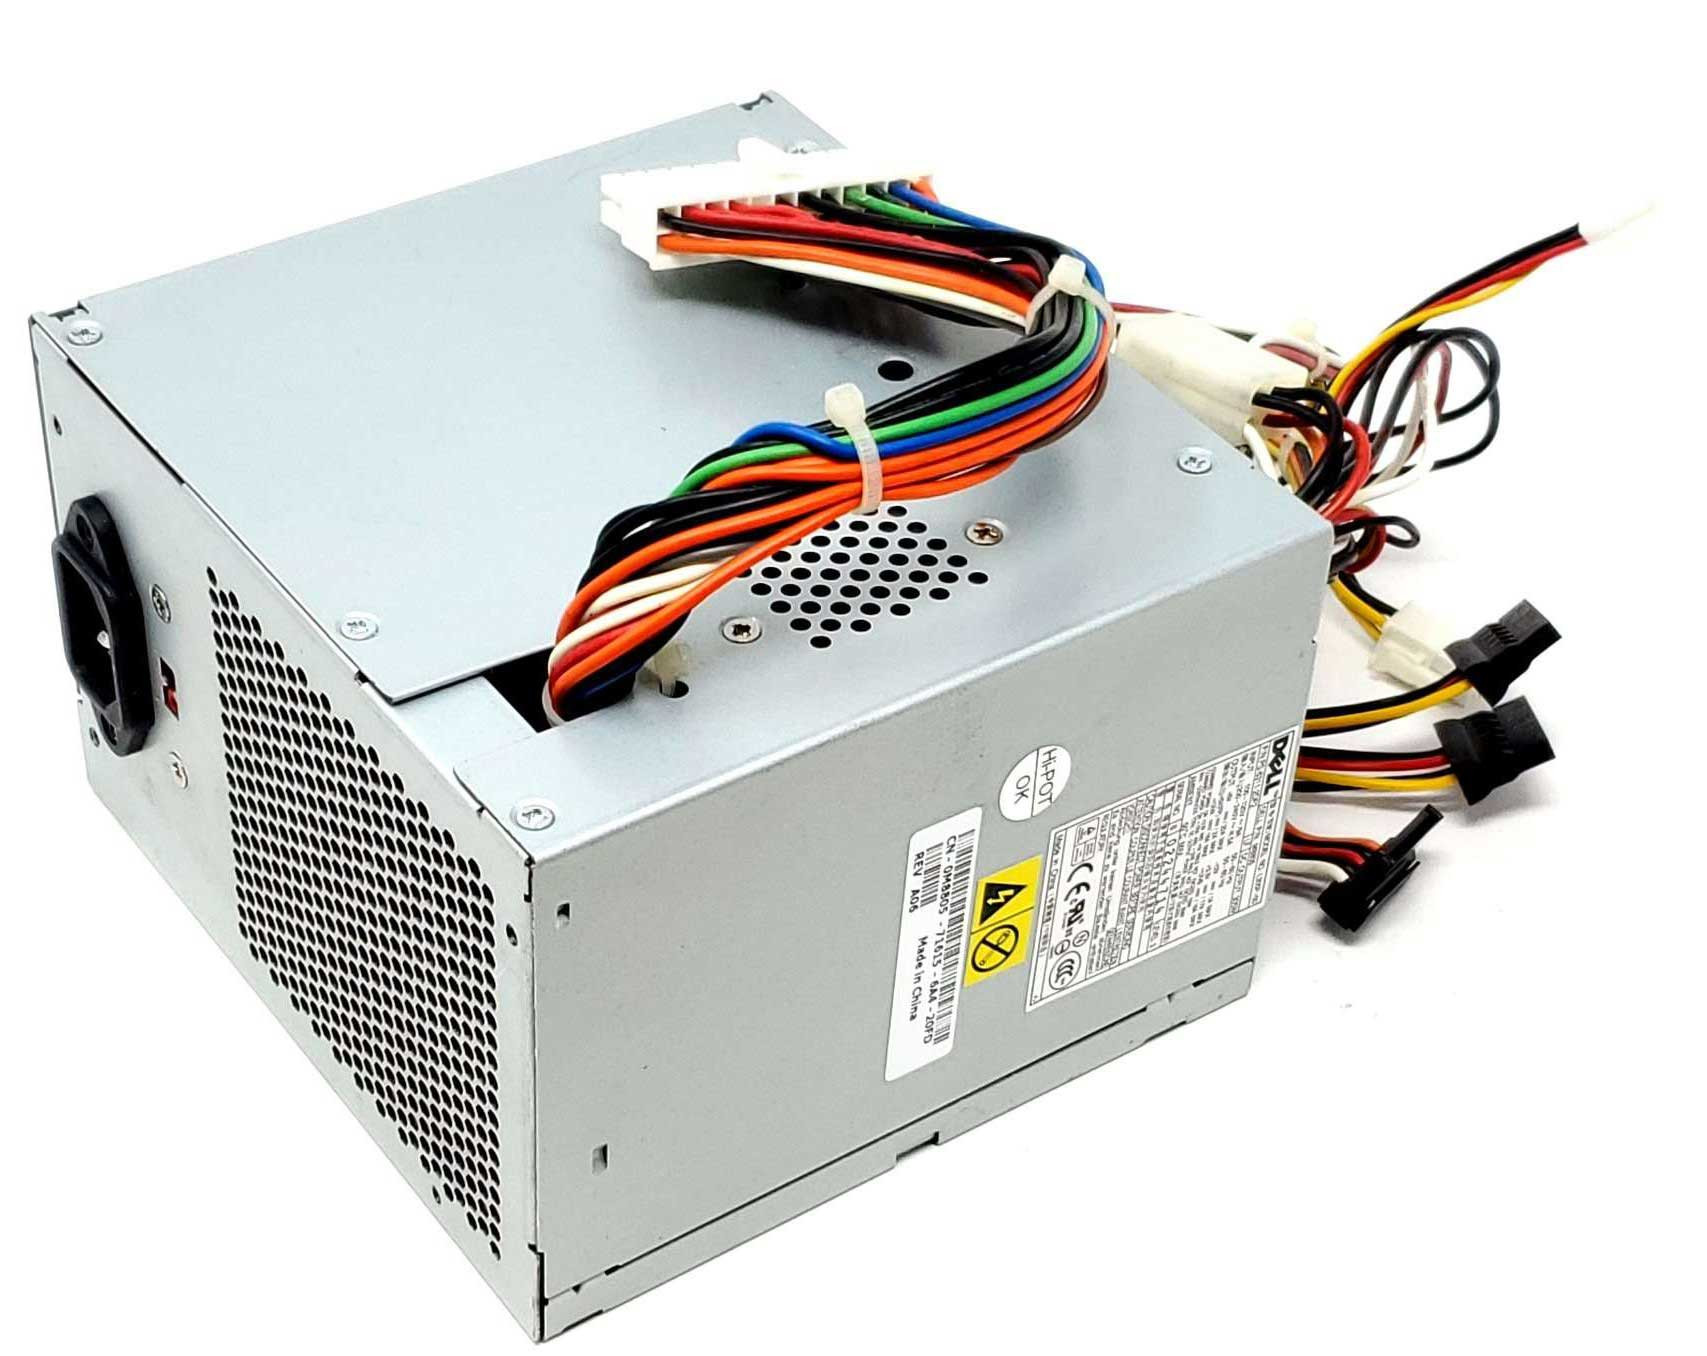 Genuine Dell Optiplex 745 760 755 MT 305W Power Supply NH493